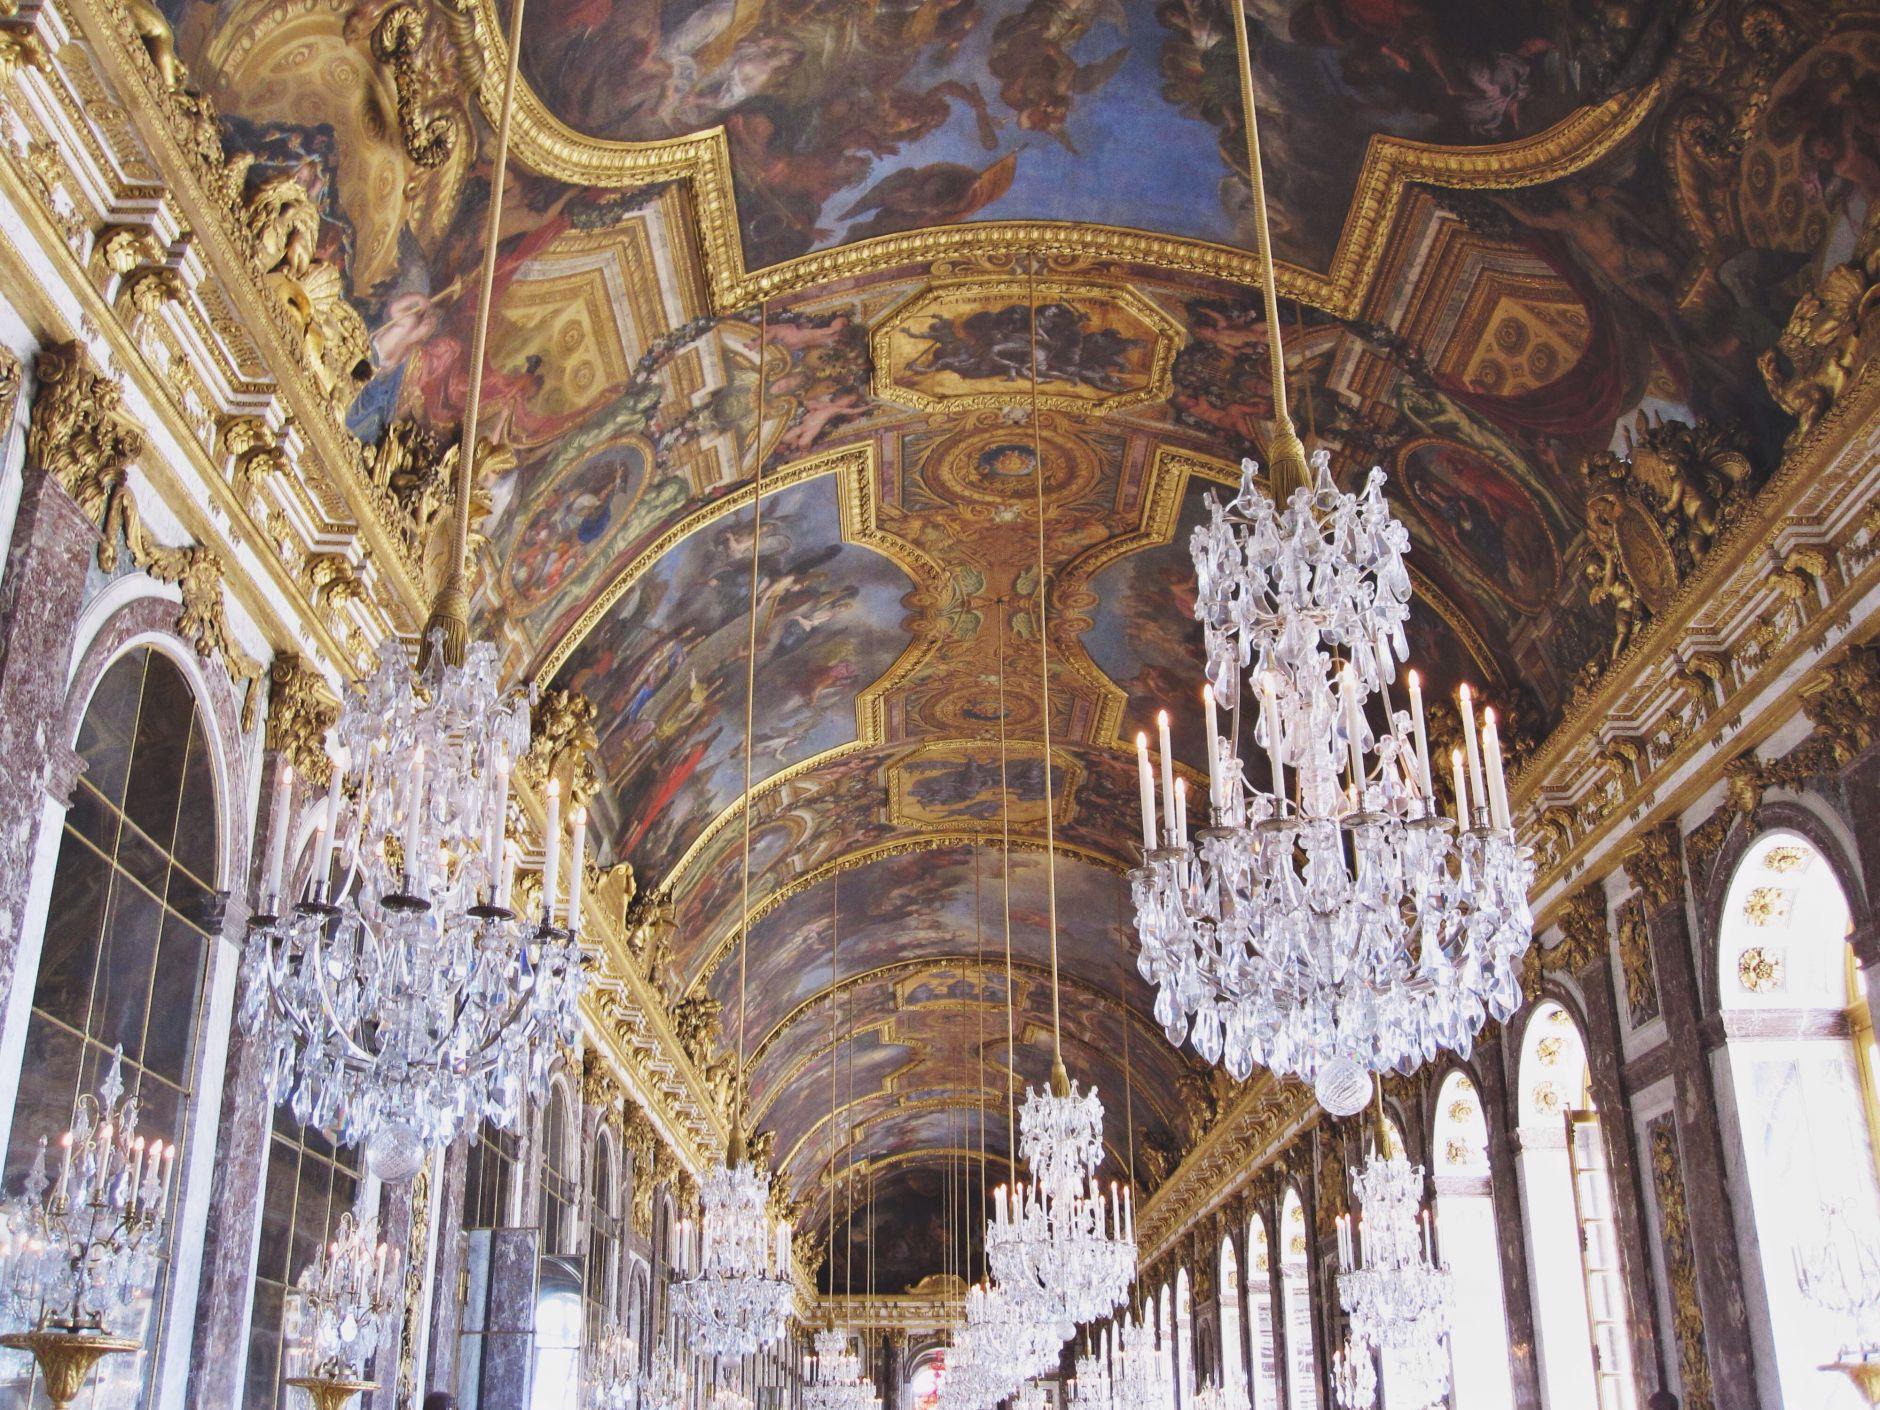 The-Mirror-Hall-at-Château-de-Versailles-Paris-Disic-Couture-01922